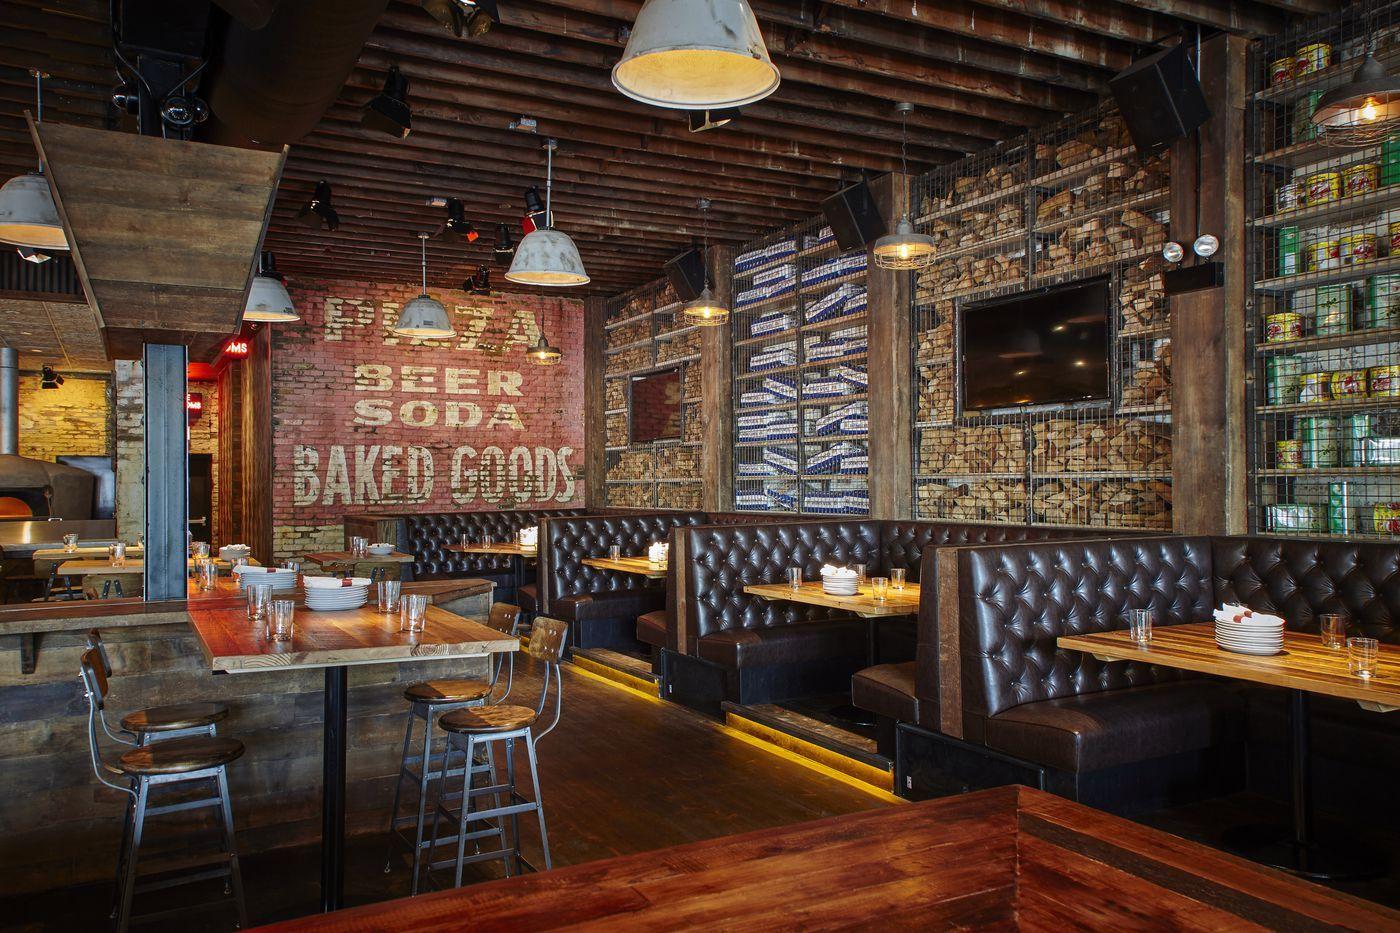 Tour Parlor Pizza Bar Wicker Park Division Street S Massive New Outdoor Space Pizza Bar Parlor Pizza Bar Pizzeria Design